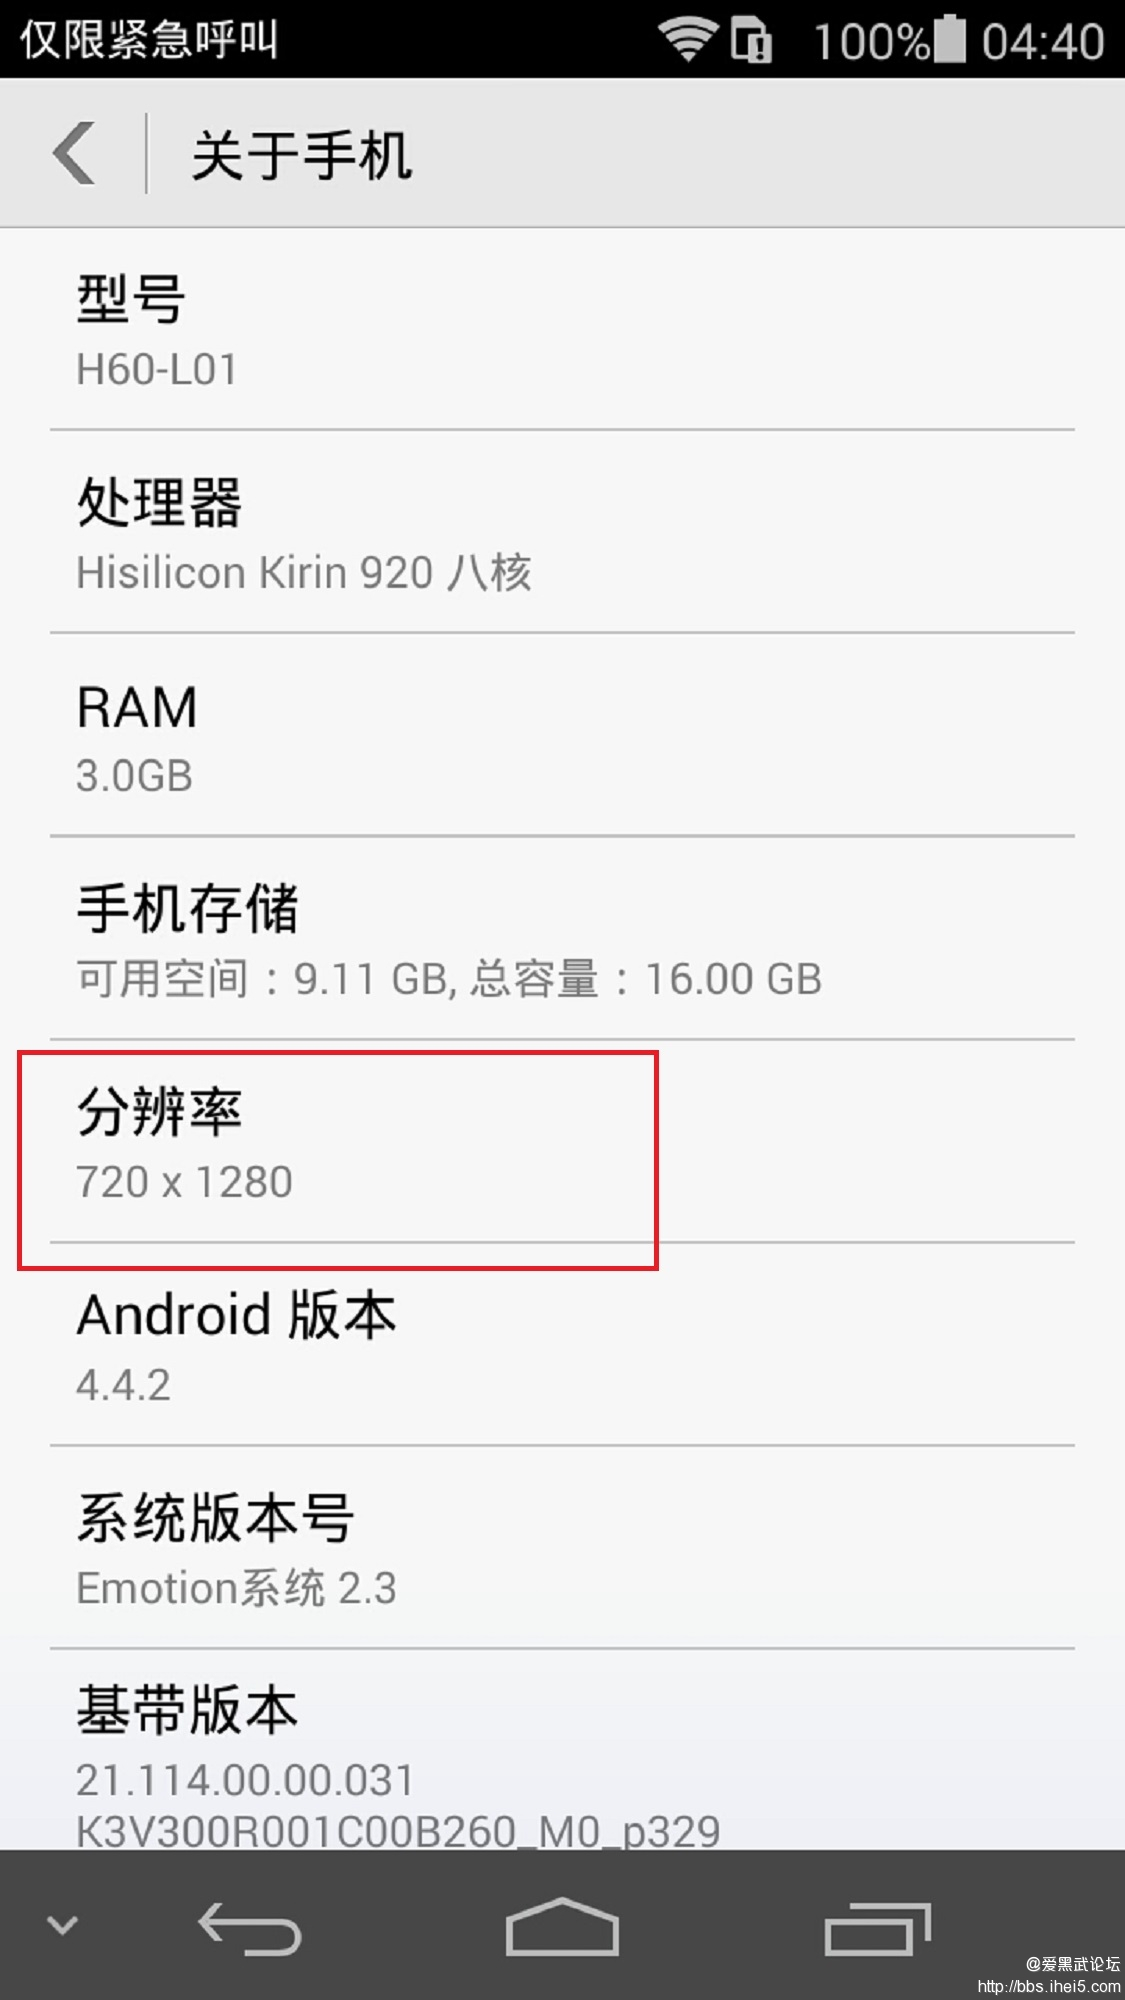 Screenshot_2014-08-01-04-40-52.jpeg